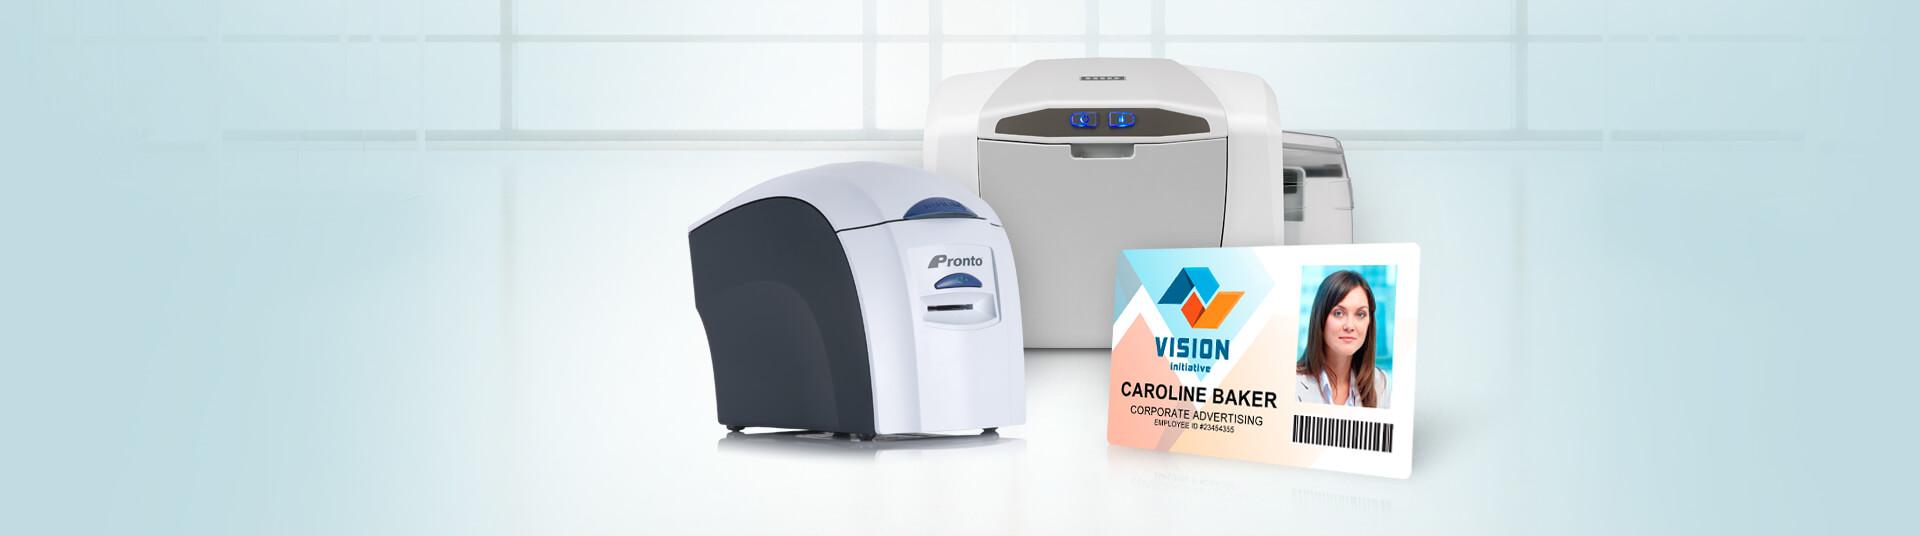 Photo ID Machines, ID Badge Machines | AlphaCard